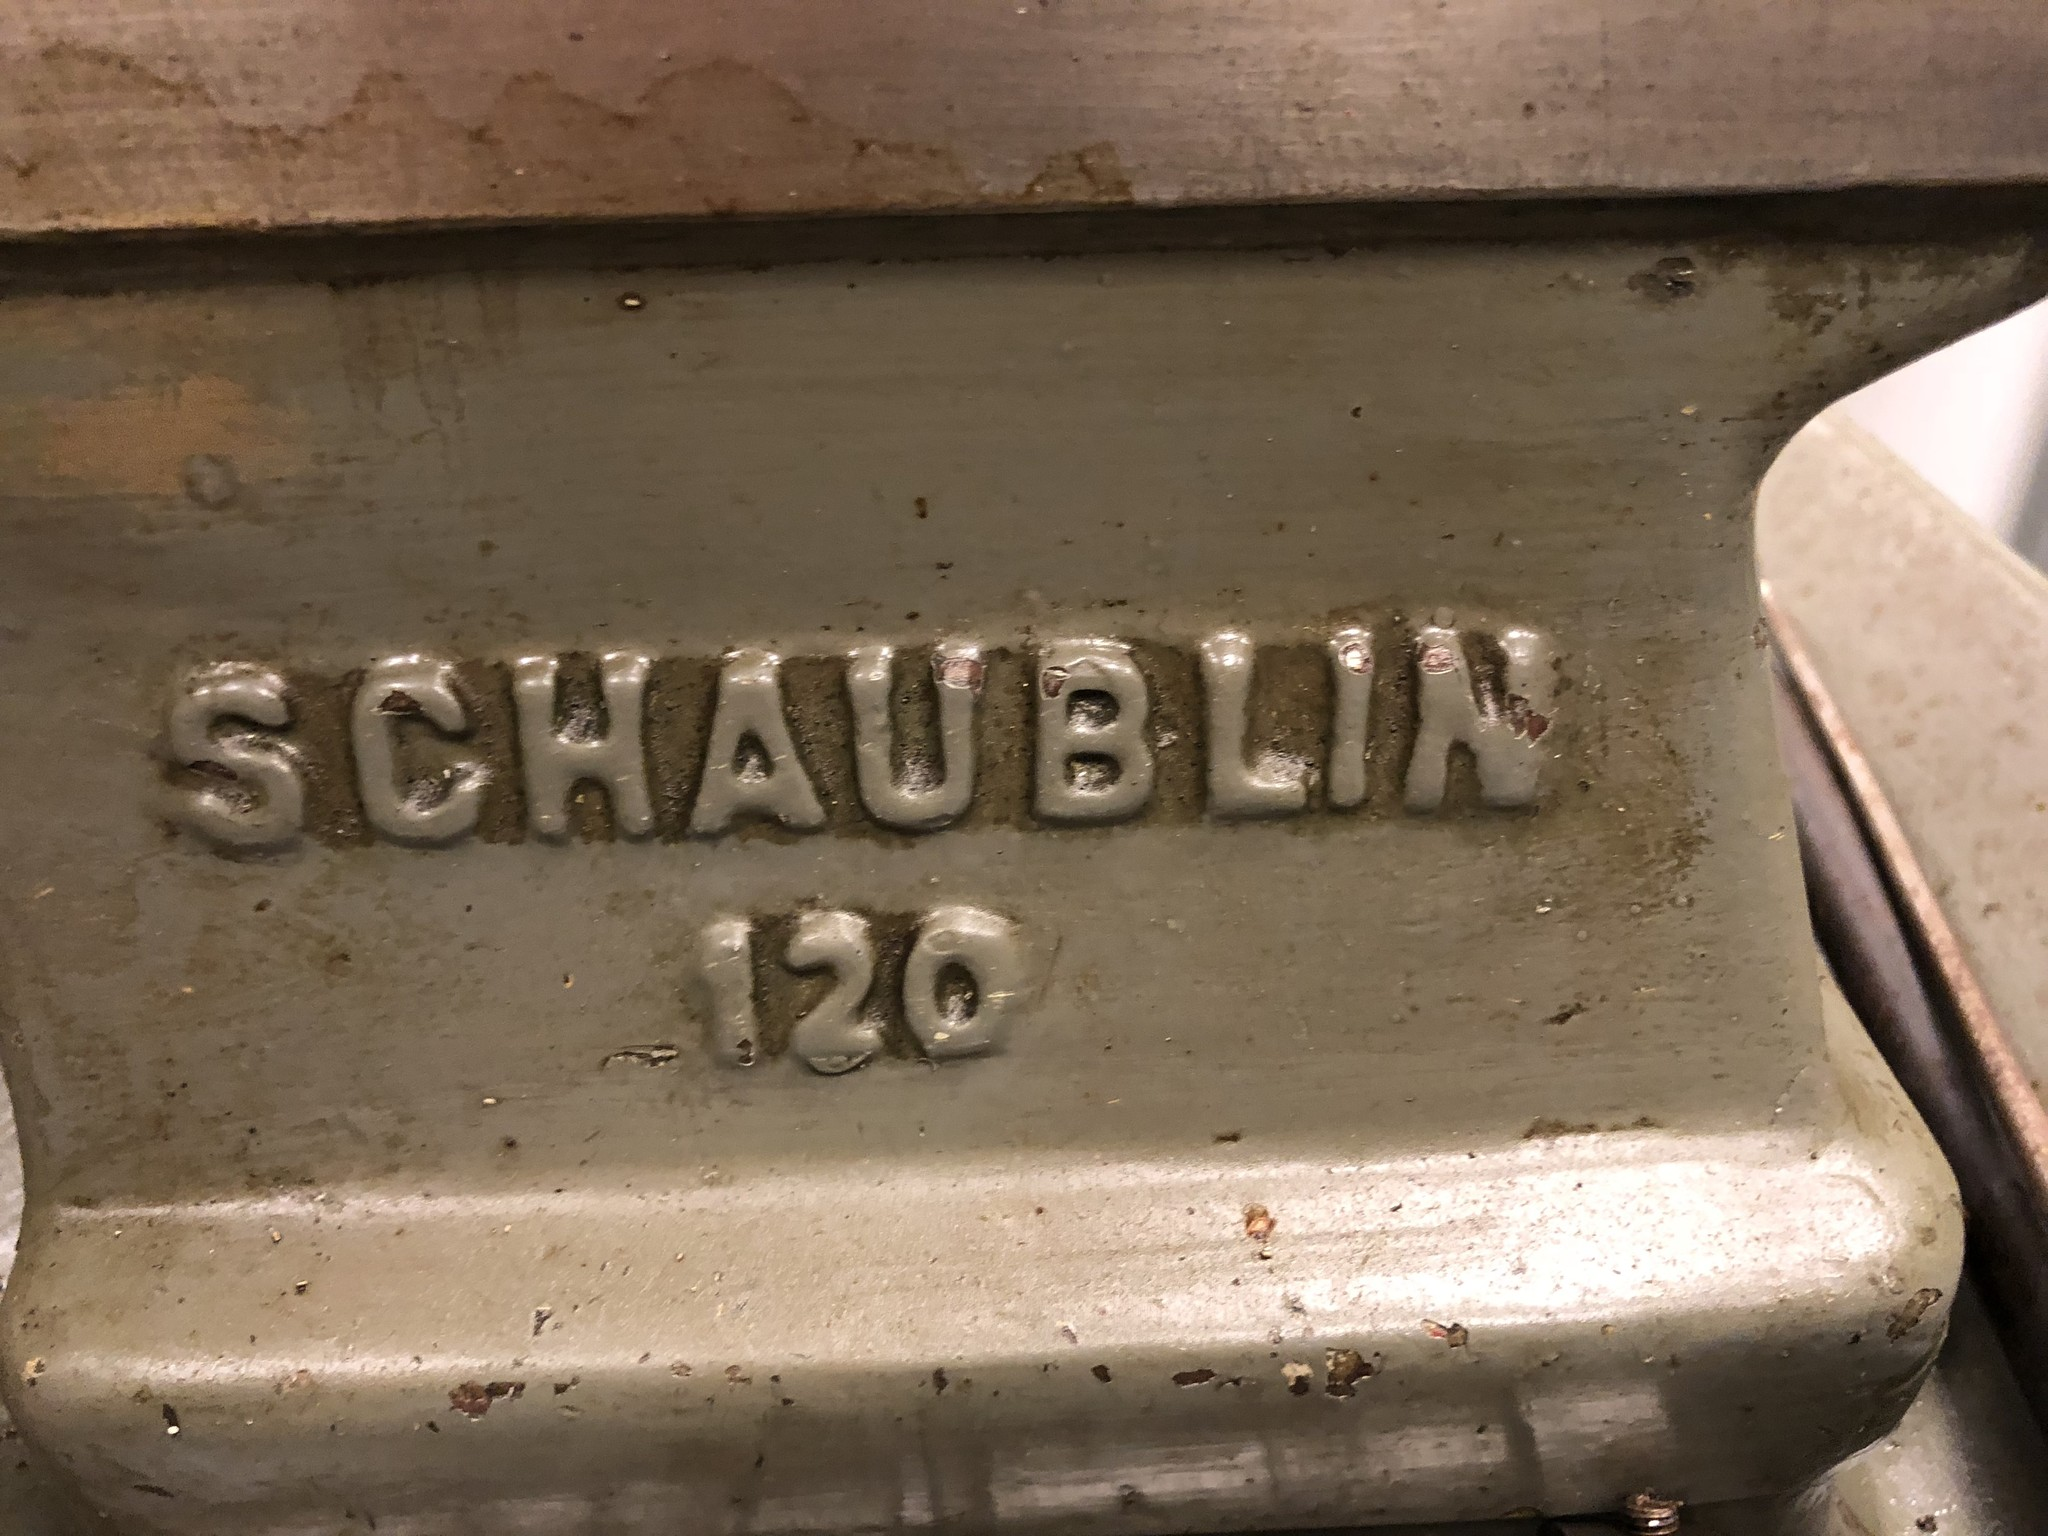 Schaublin Schaublin 120 draaibank